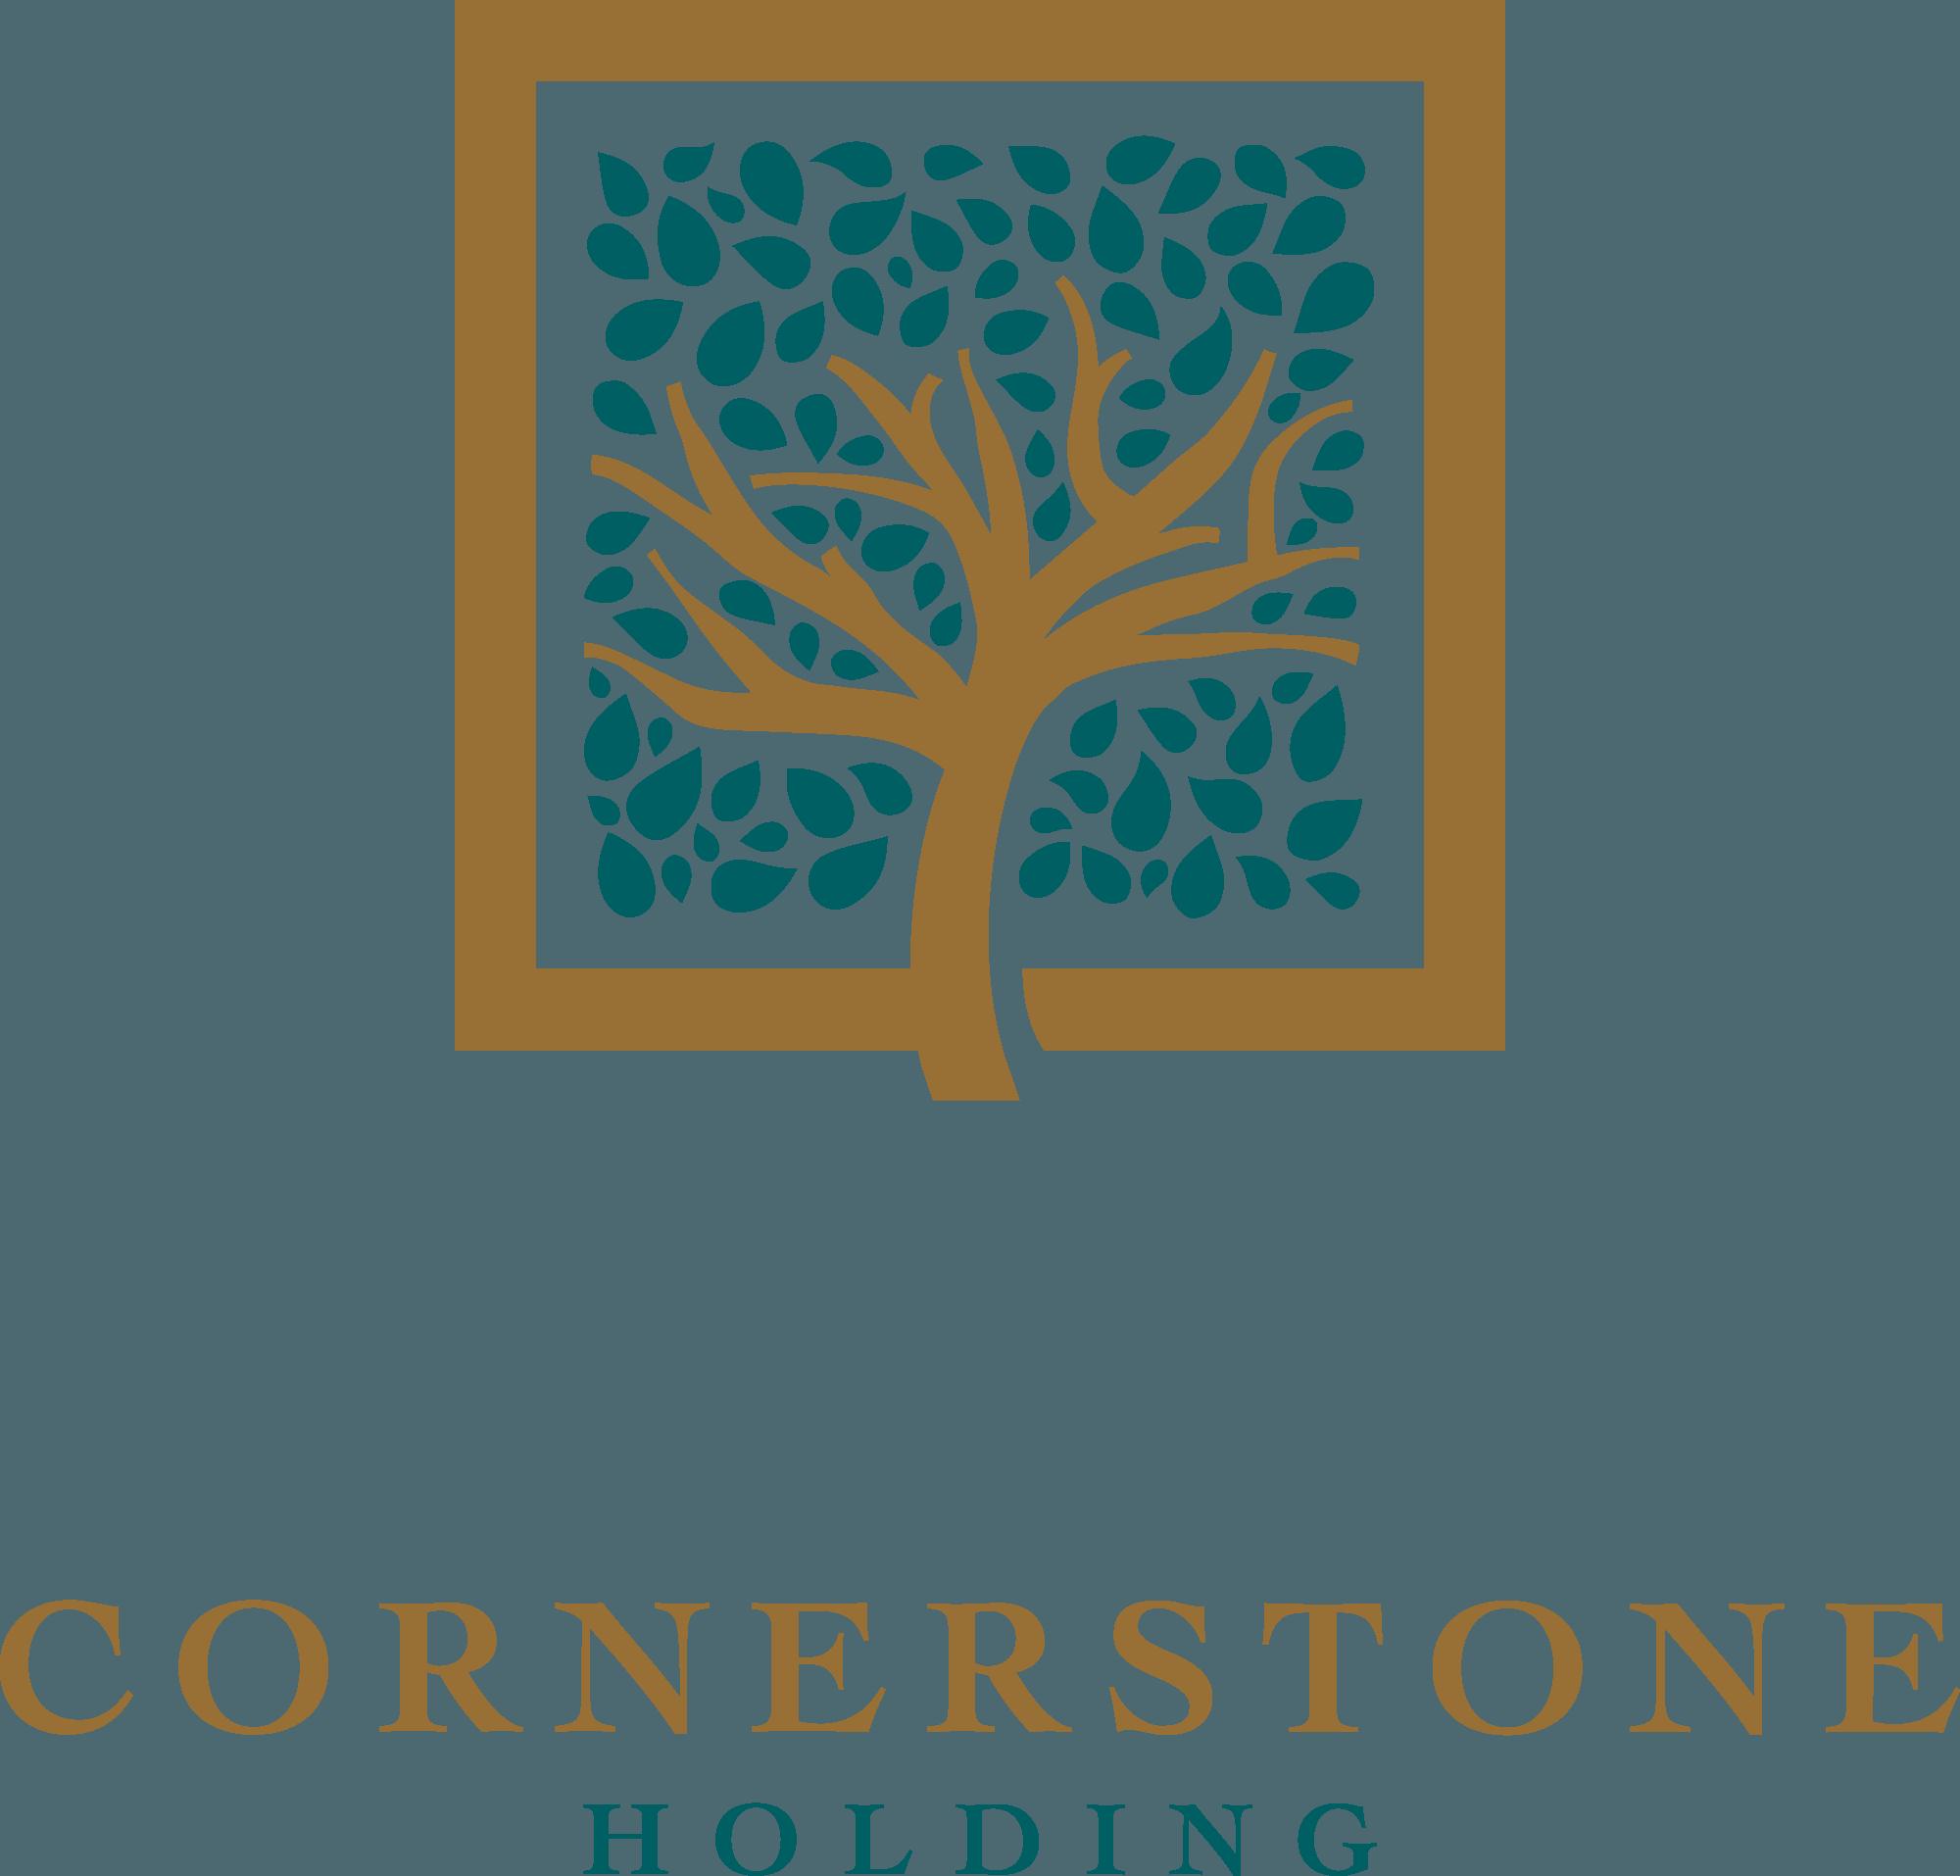 cornerstone 04.png